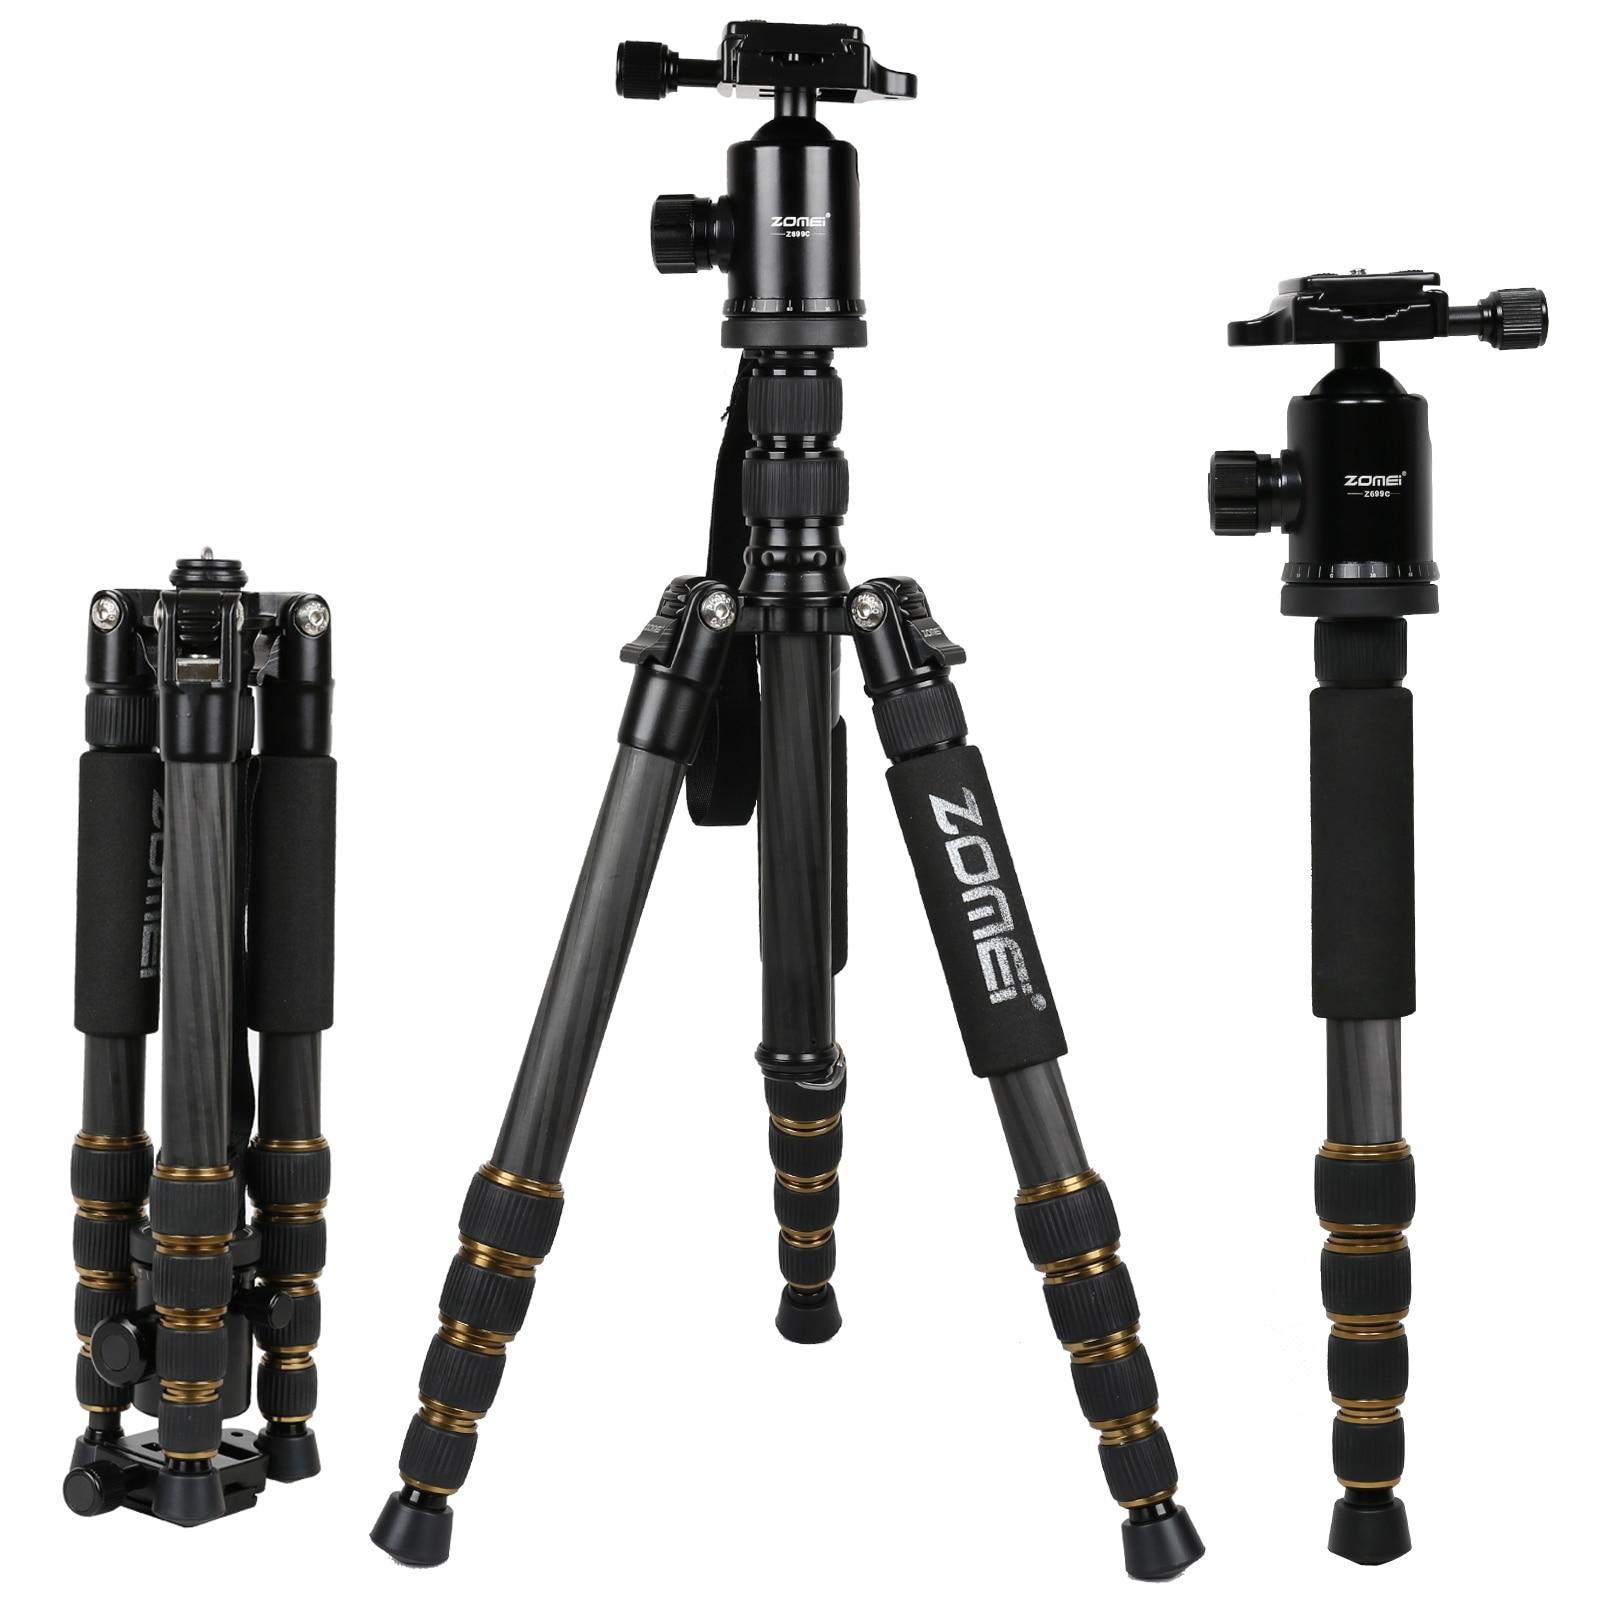 ZOMEI Z699C 탄소 섬유 휴대용 삼각대와 볼 헤드 소형 여행 모노 포드 디지털 SLR DSLR 비디오 카메라